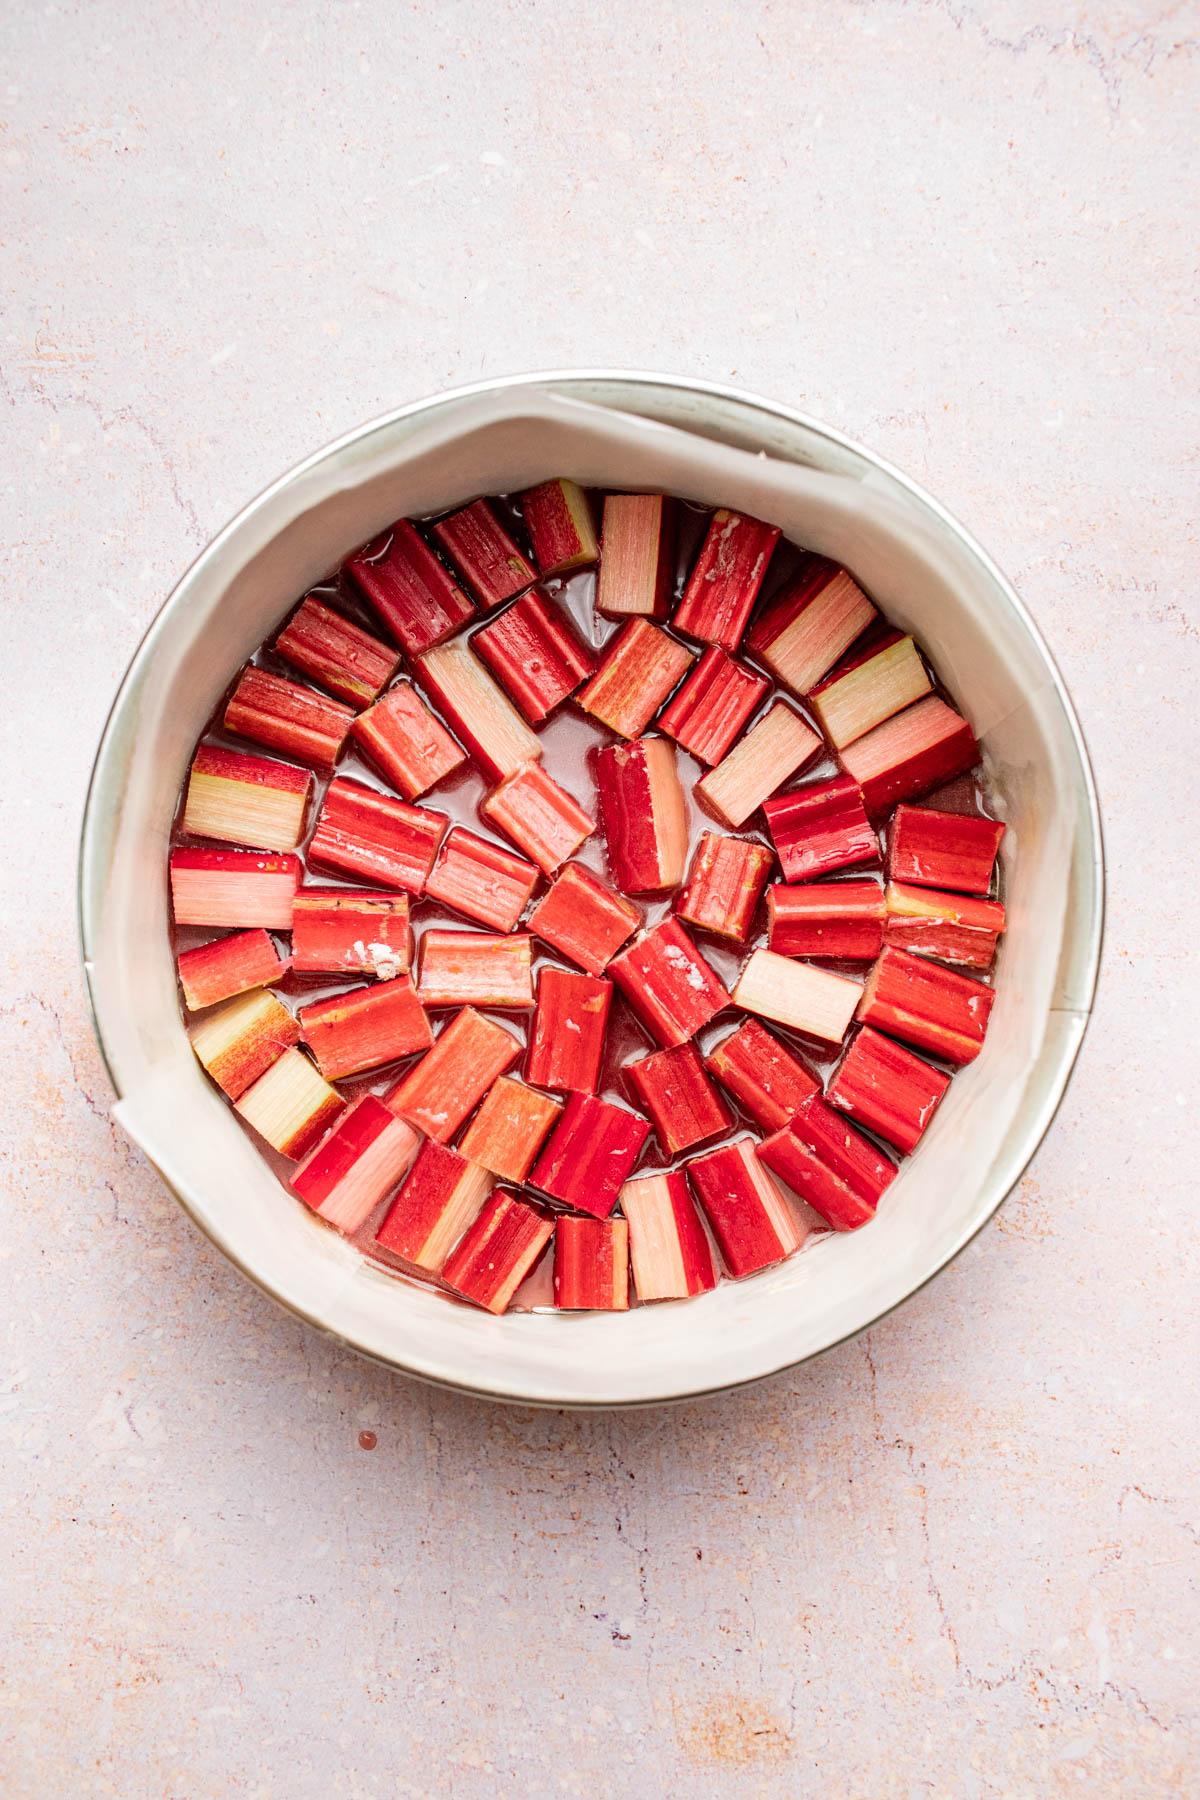 Rhubarb arranged on the base of the cake tin.